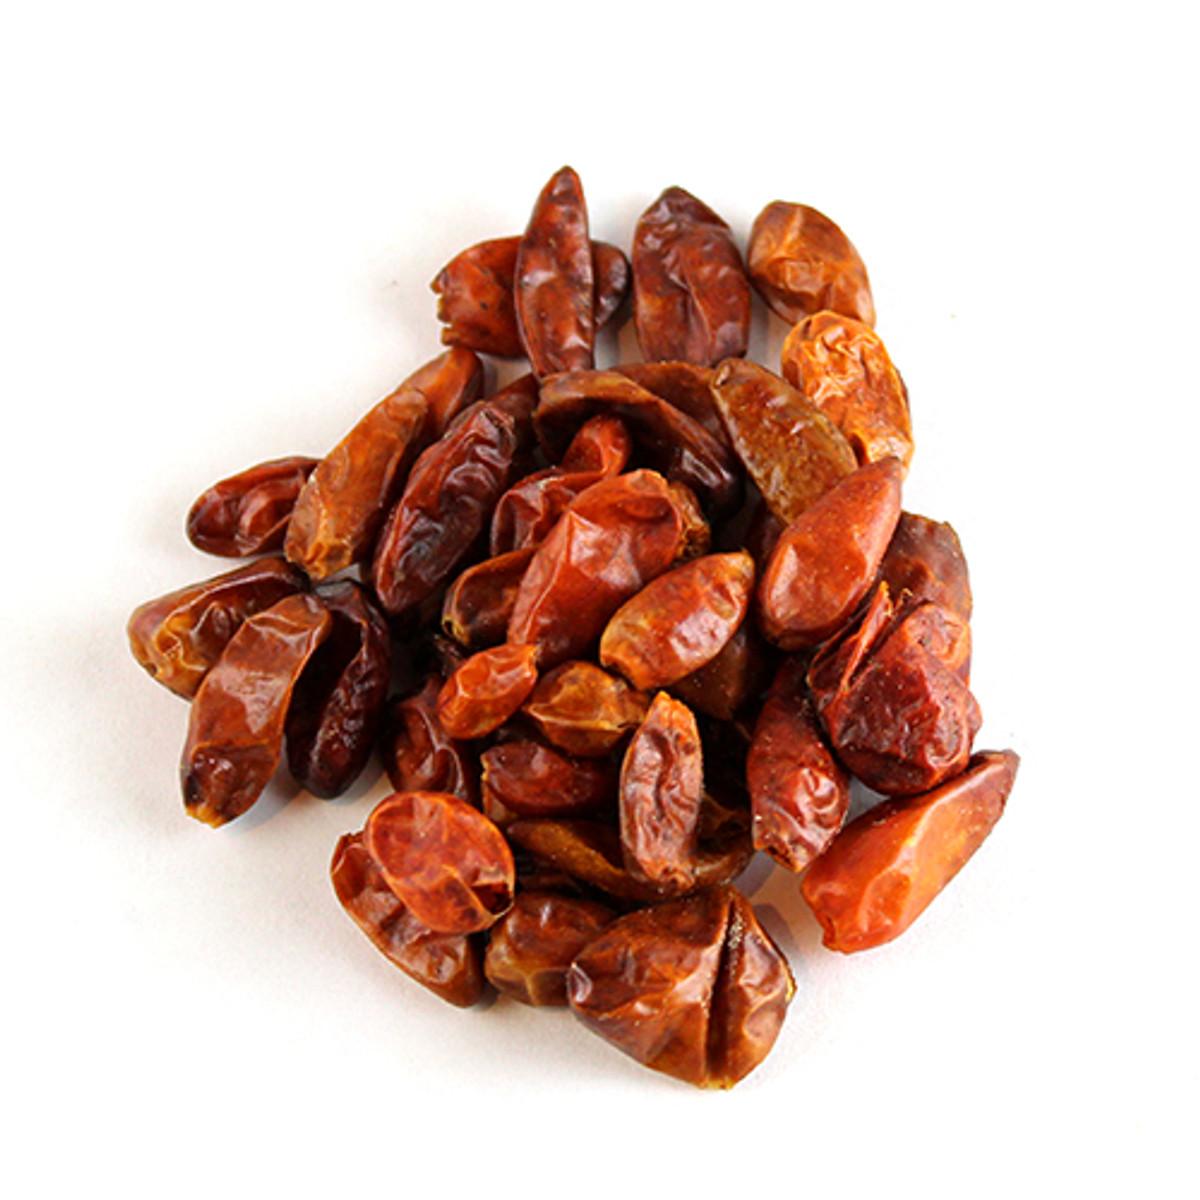 Pequin Chili Pods - Whole